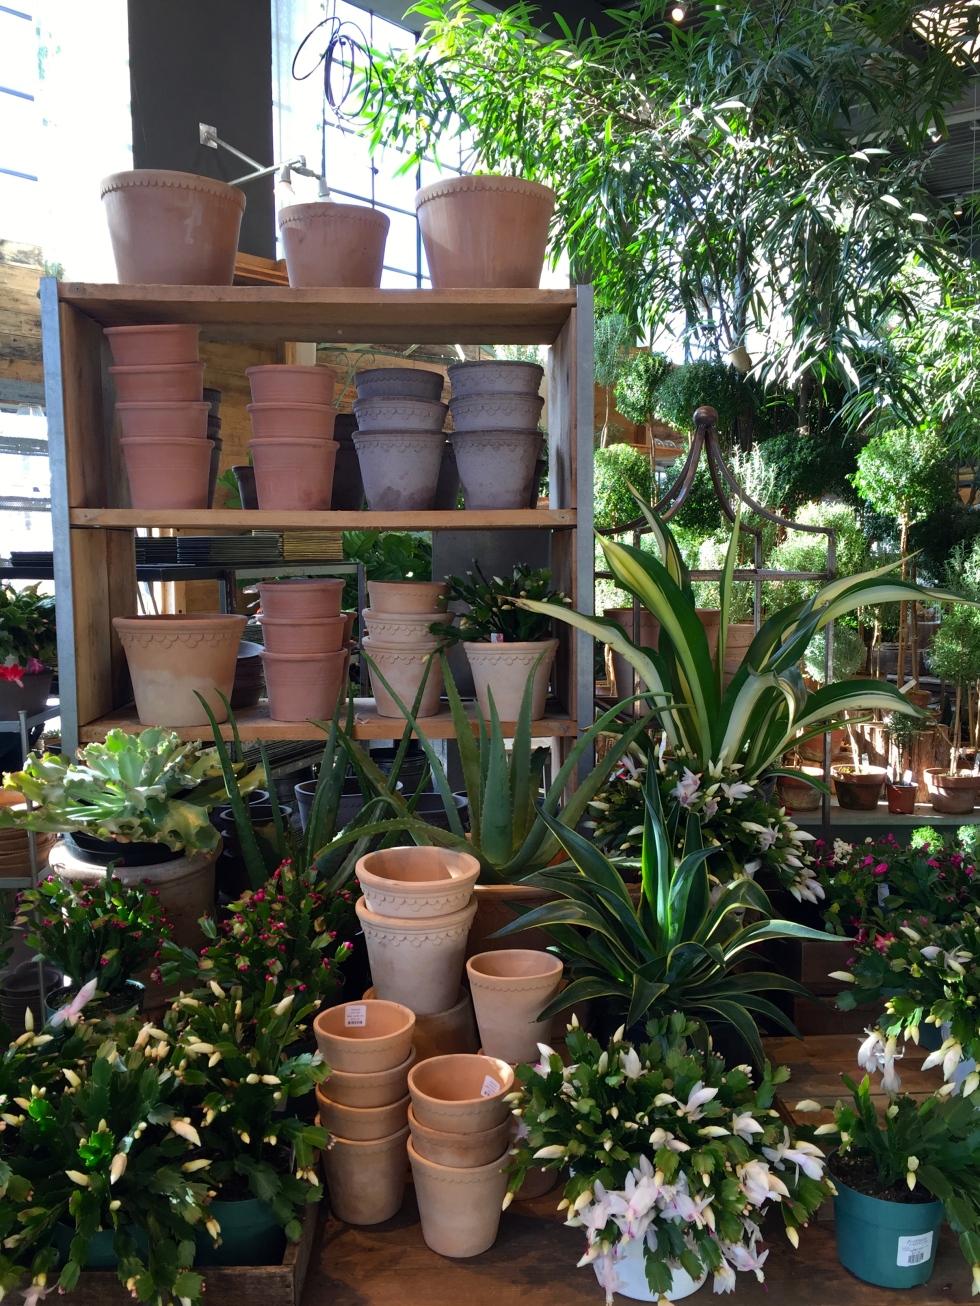 Pots and house plants, Terrain, Westport, December 2016